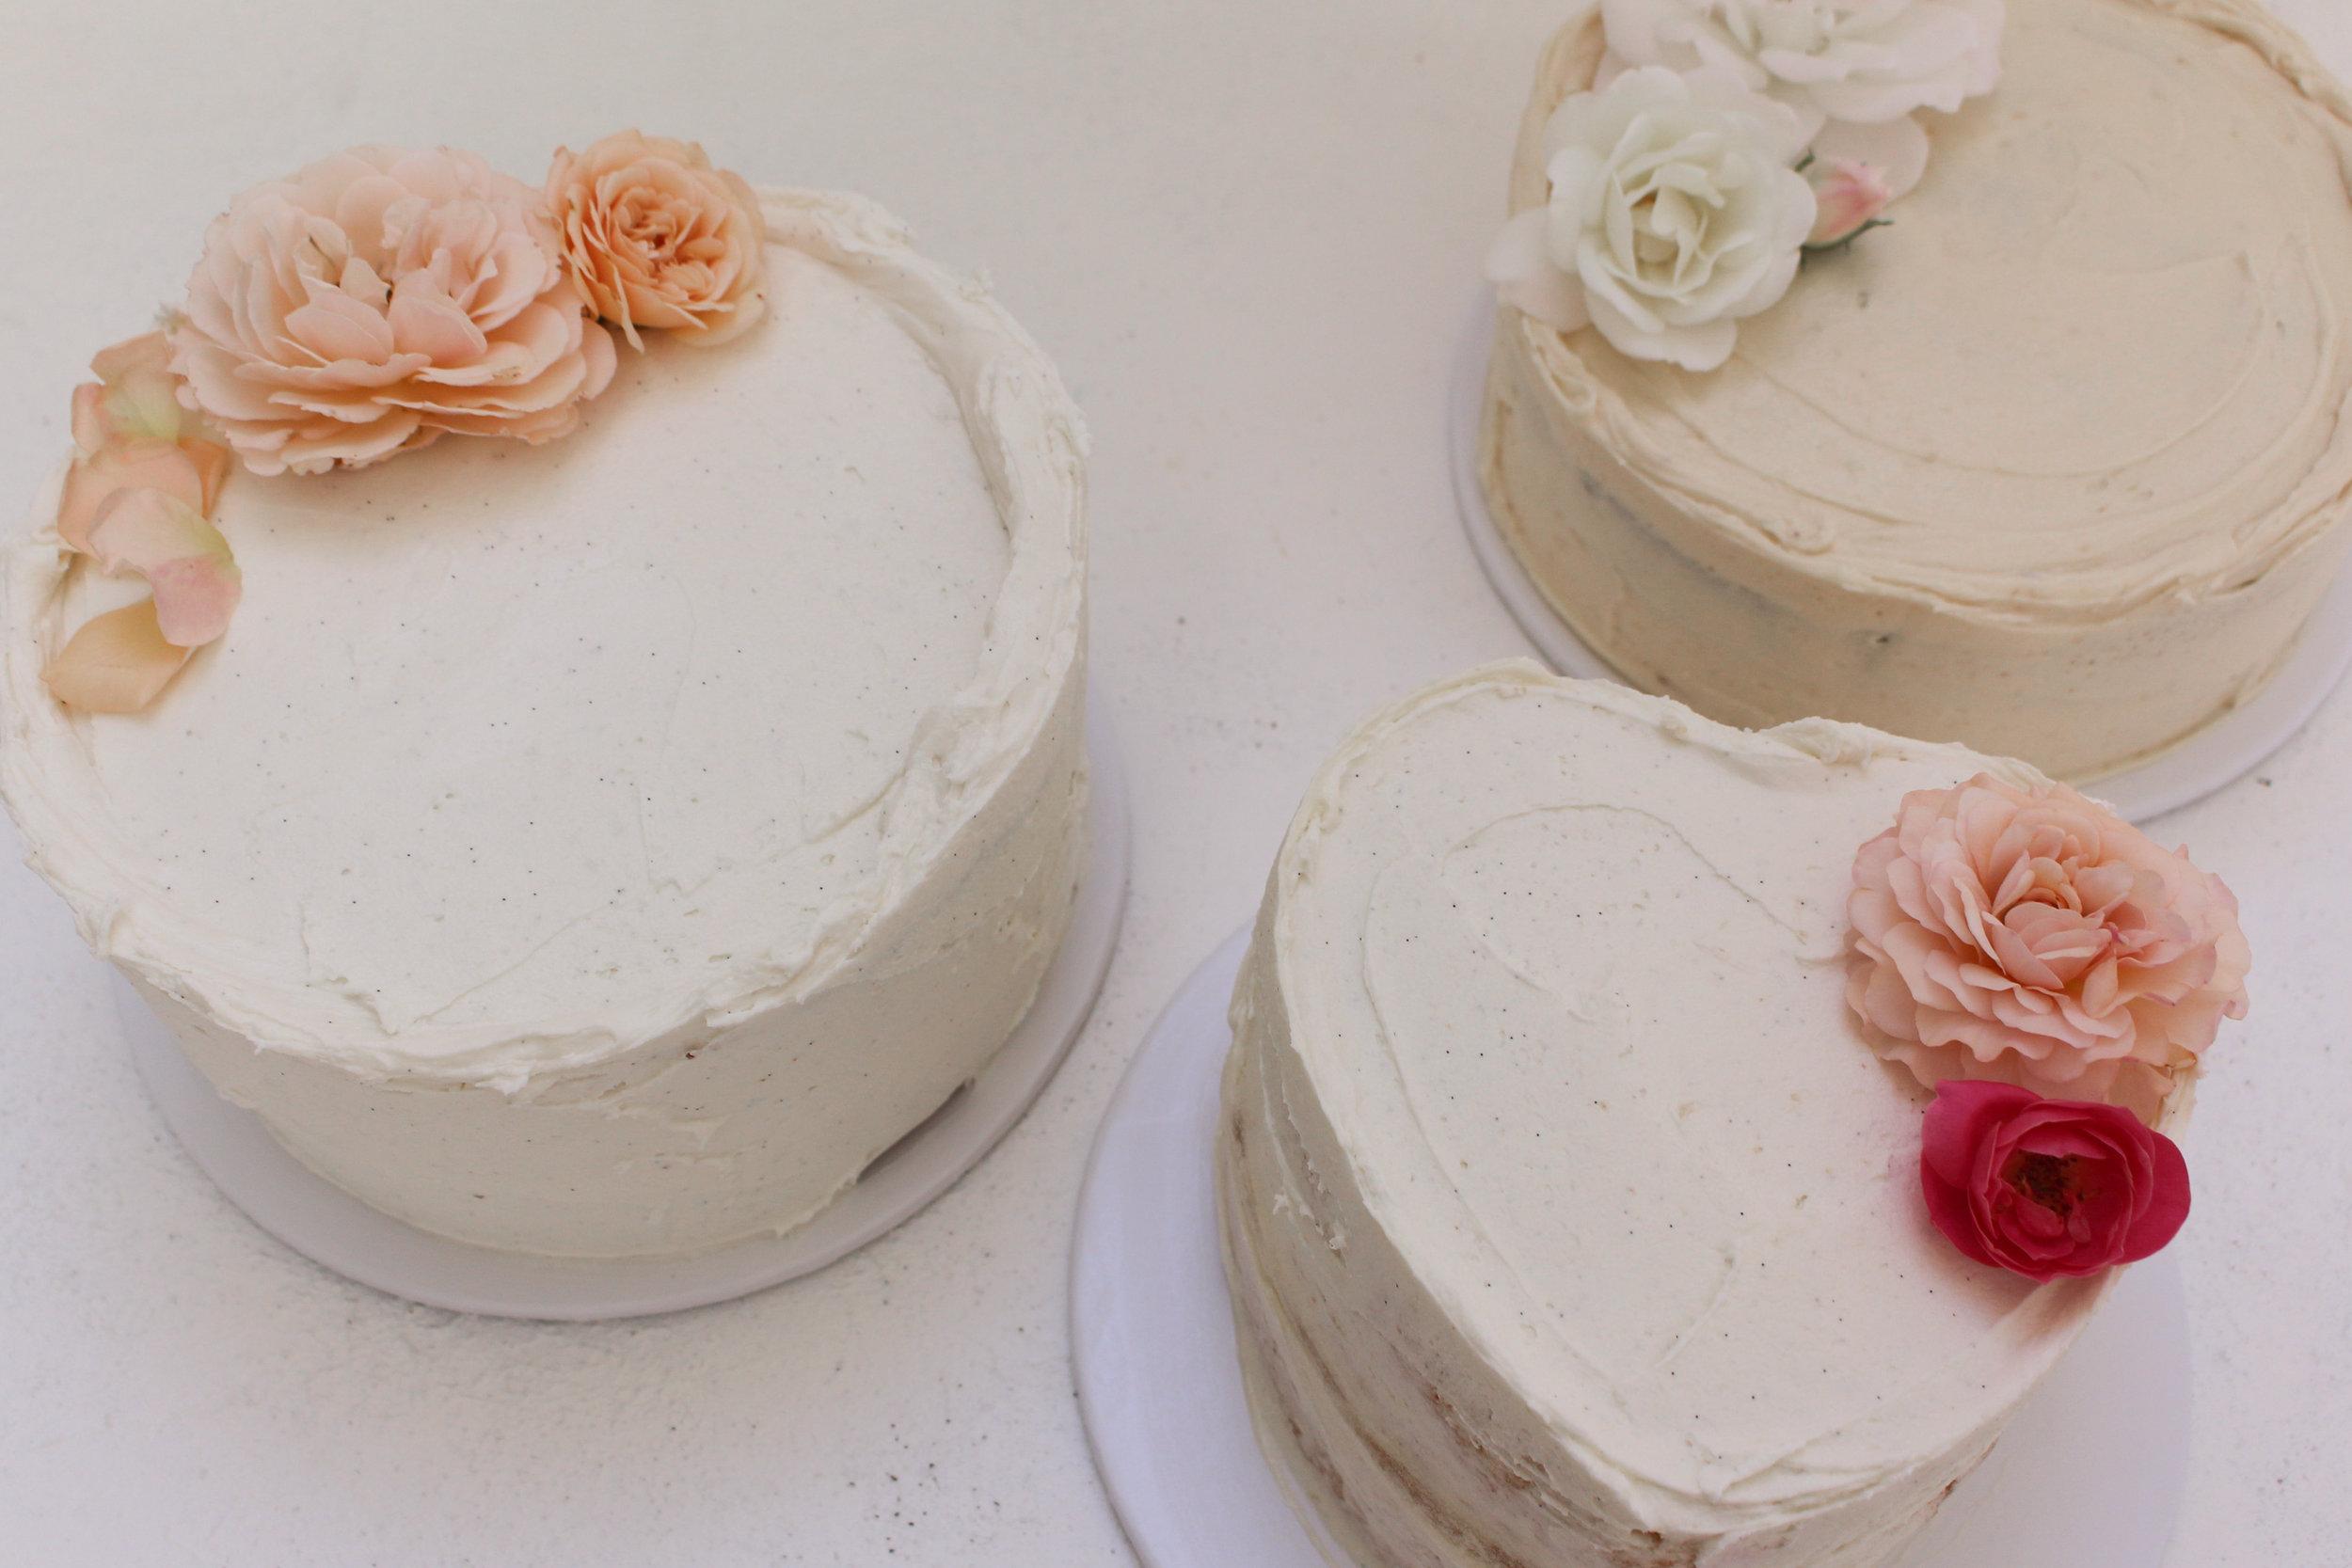 < trio of wedding cake testers >